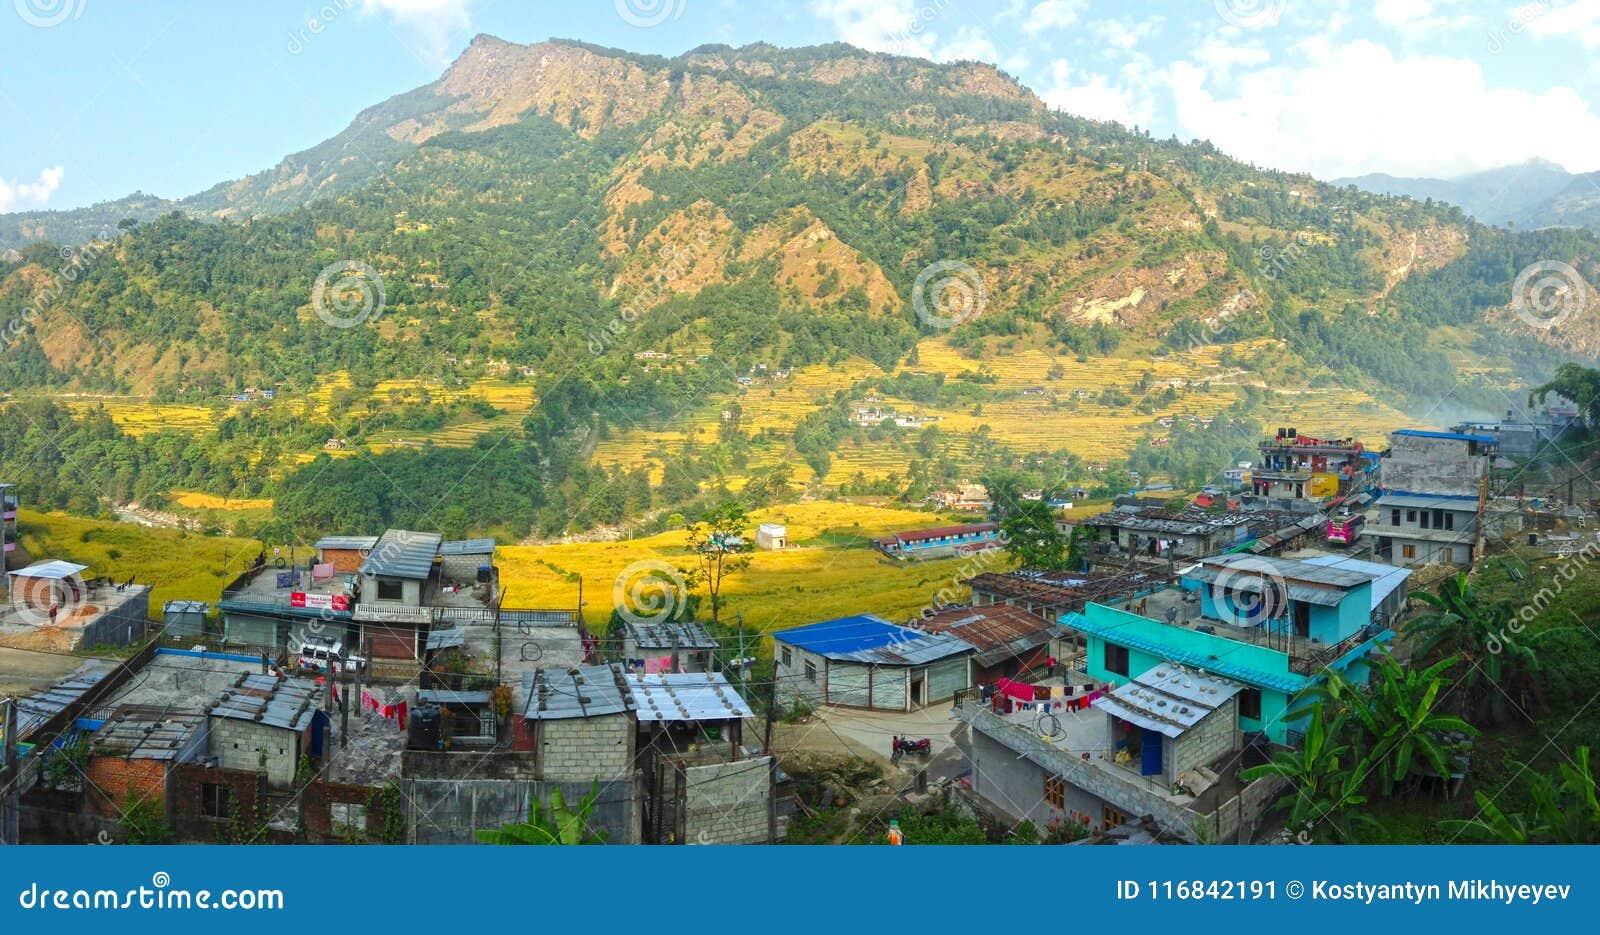 Village in Himalayas Mountains Annapurna trek